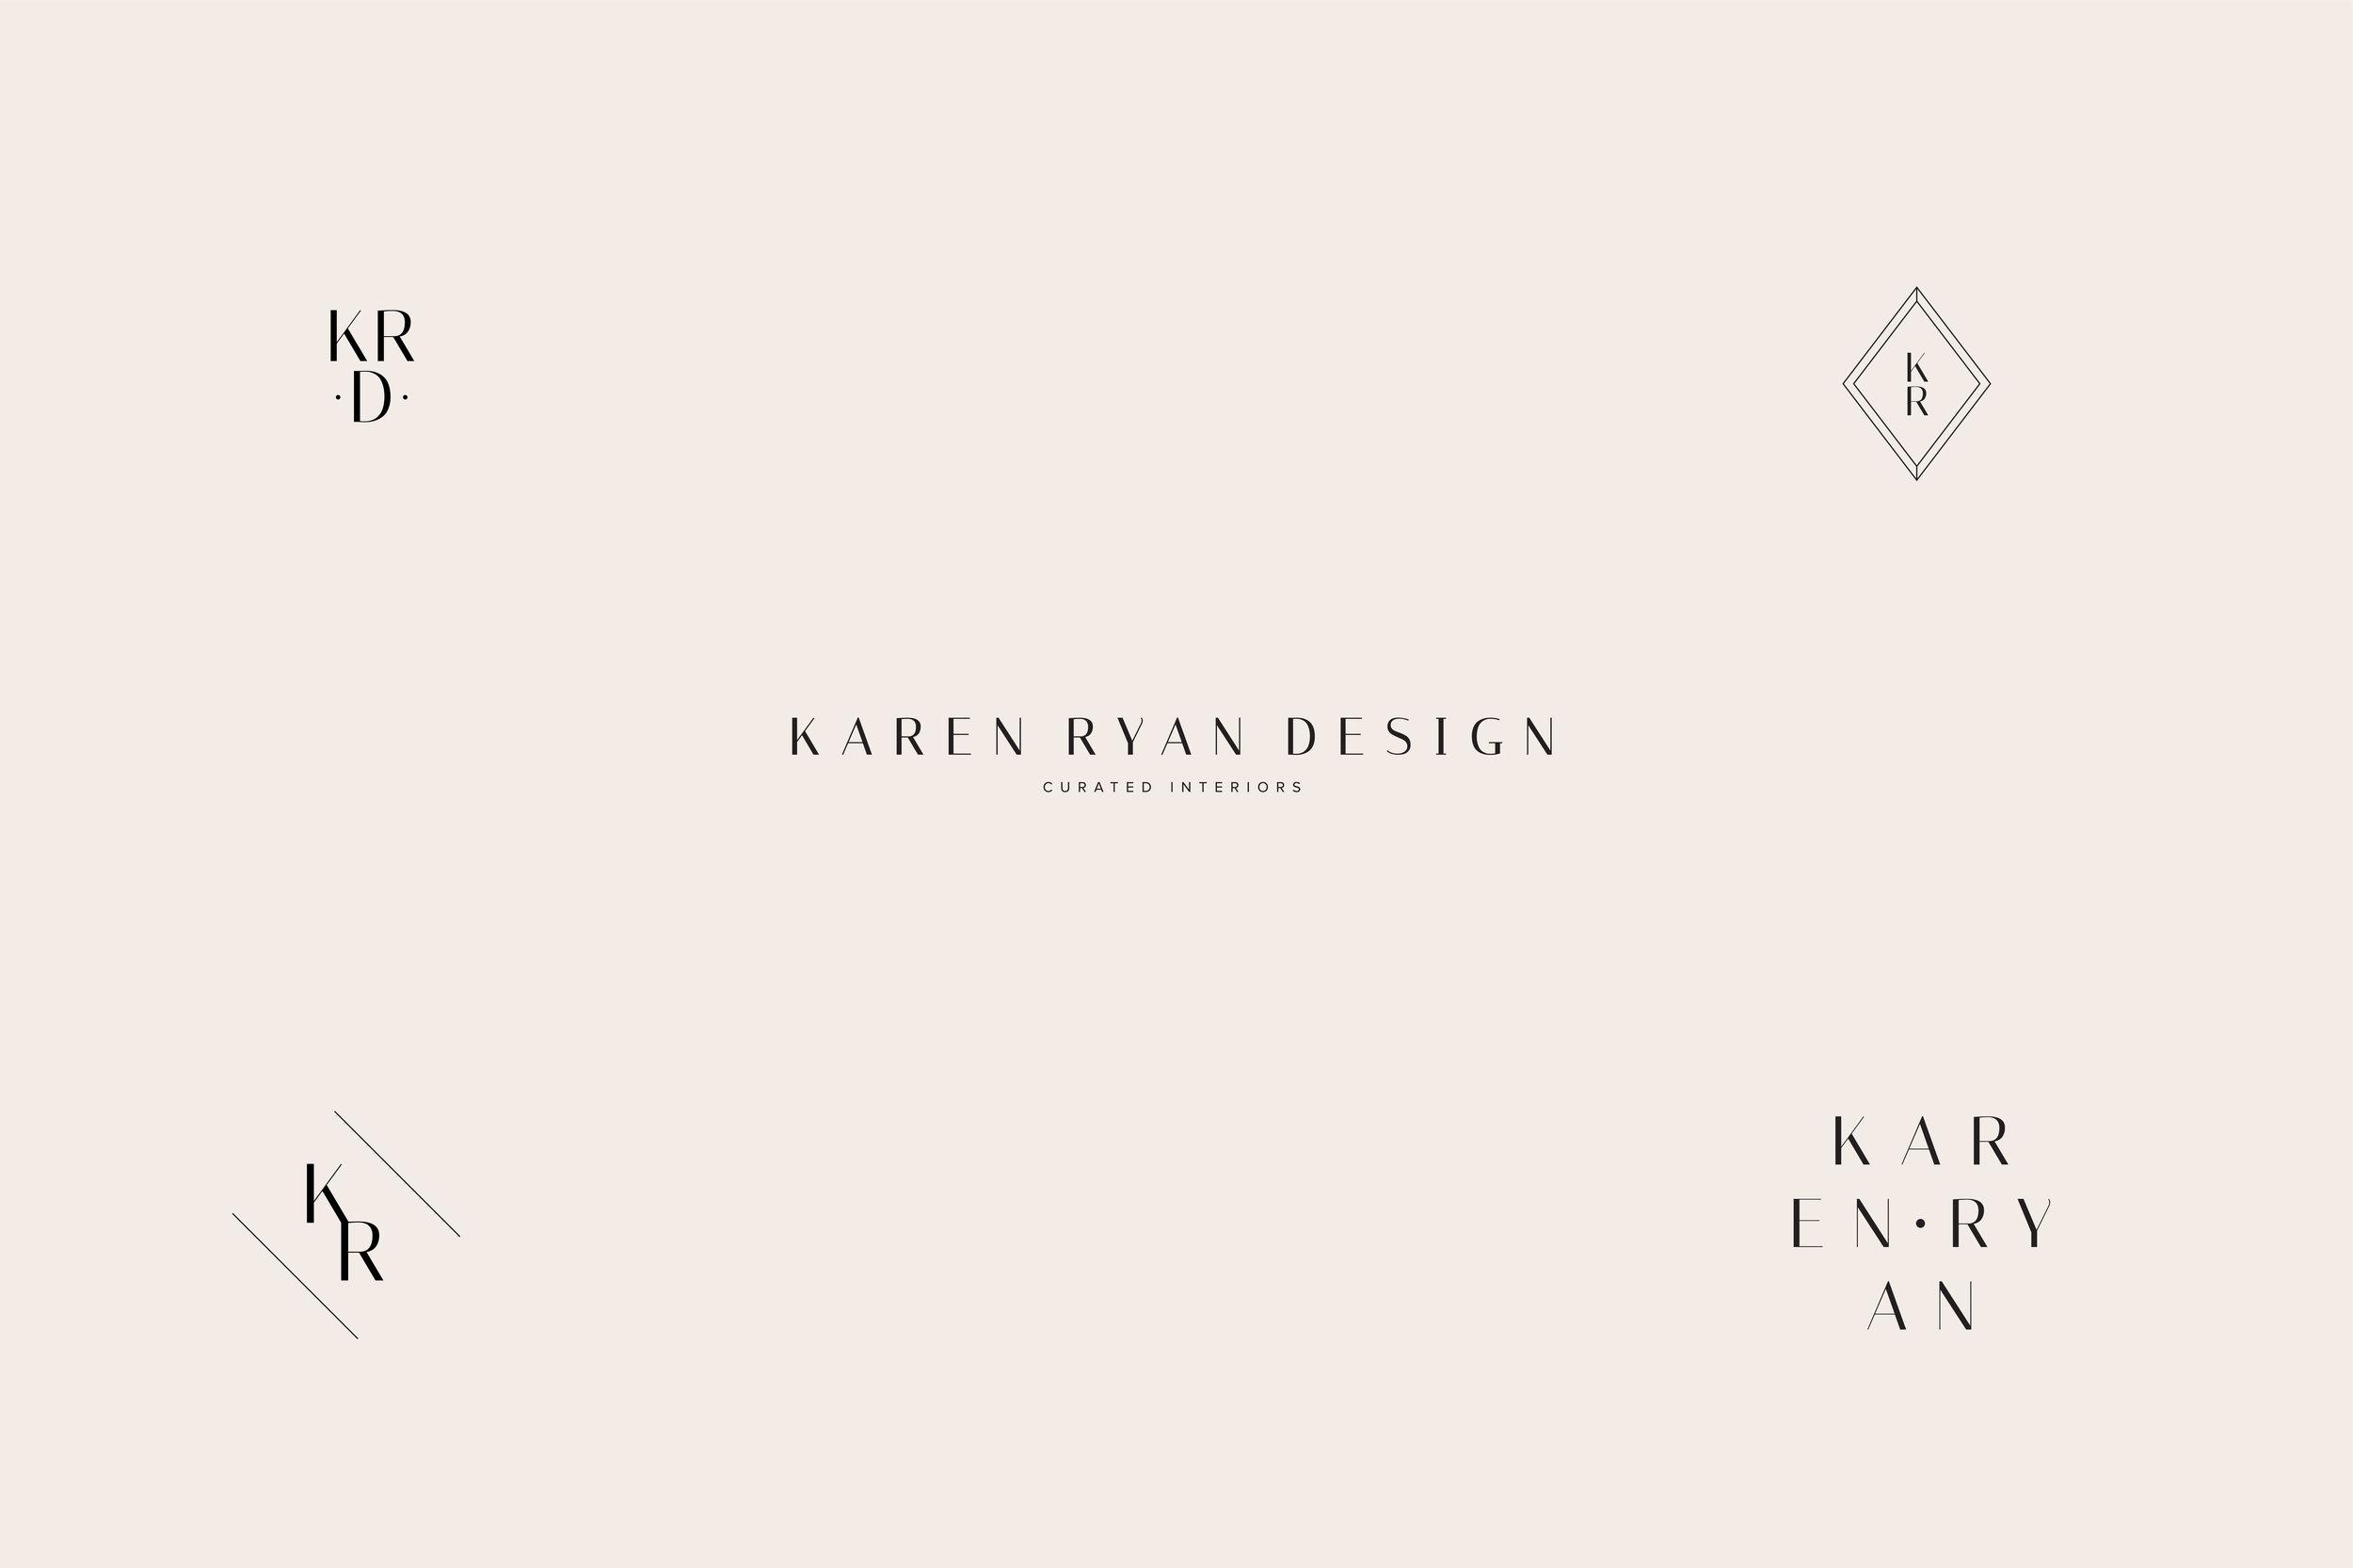 karen-ryan-design-interior-design-calgary-swell-yyc-graphic-design-02.jpg